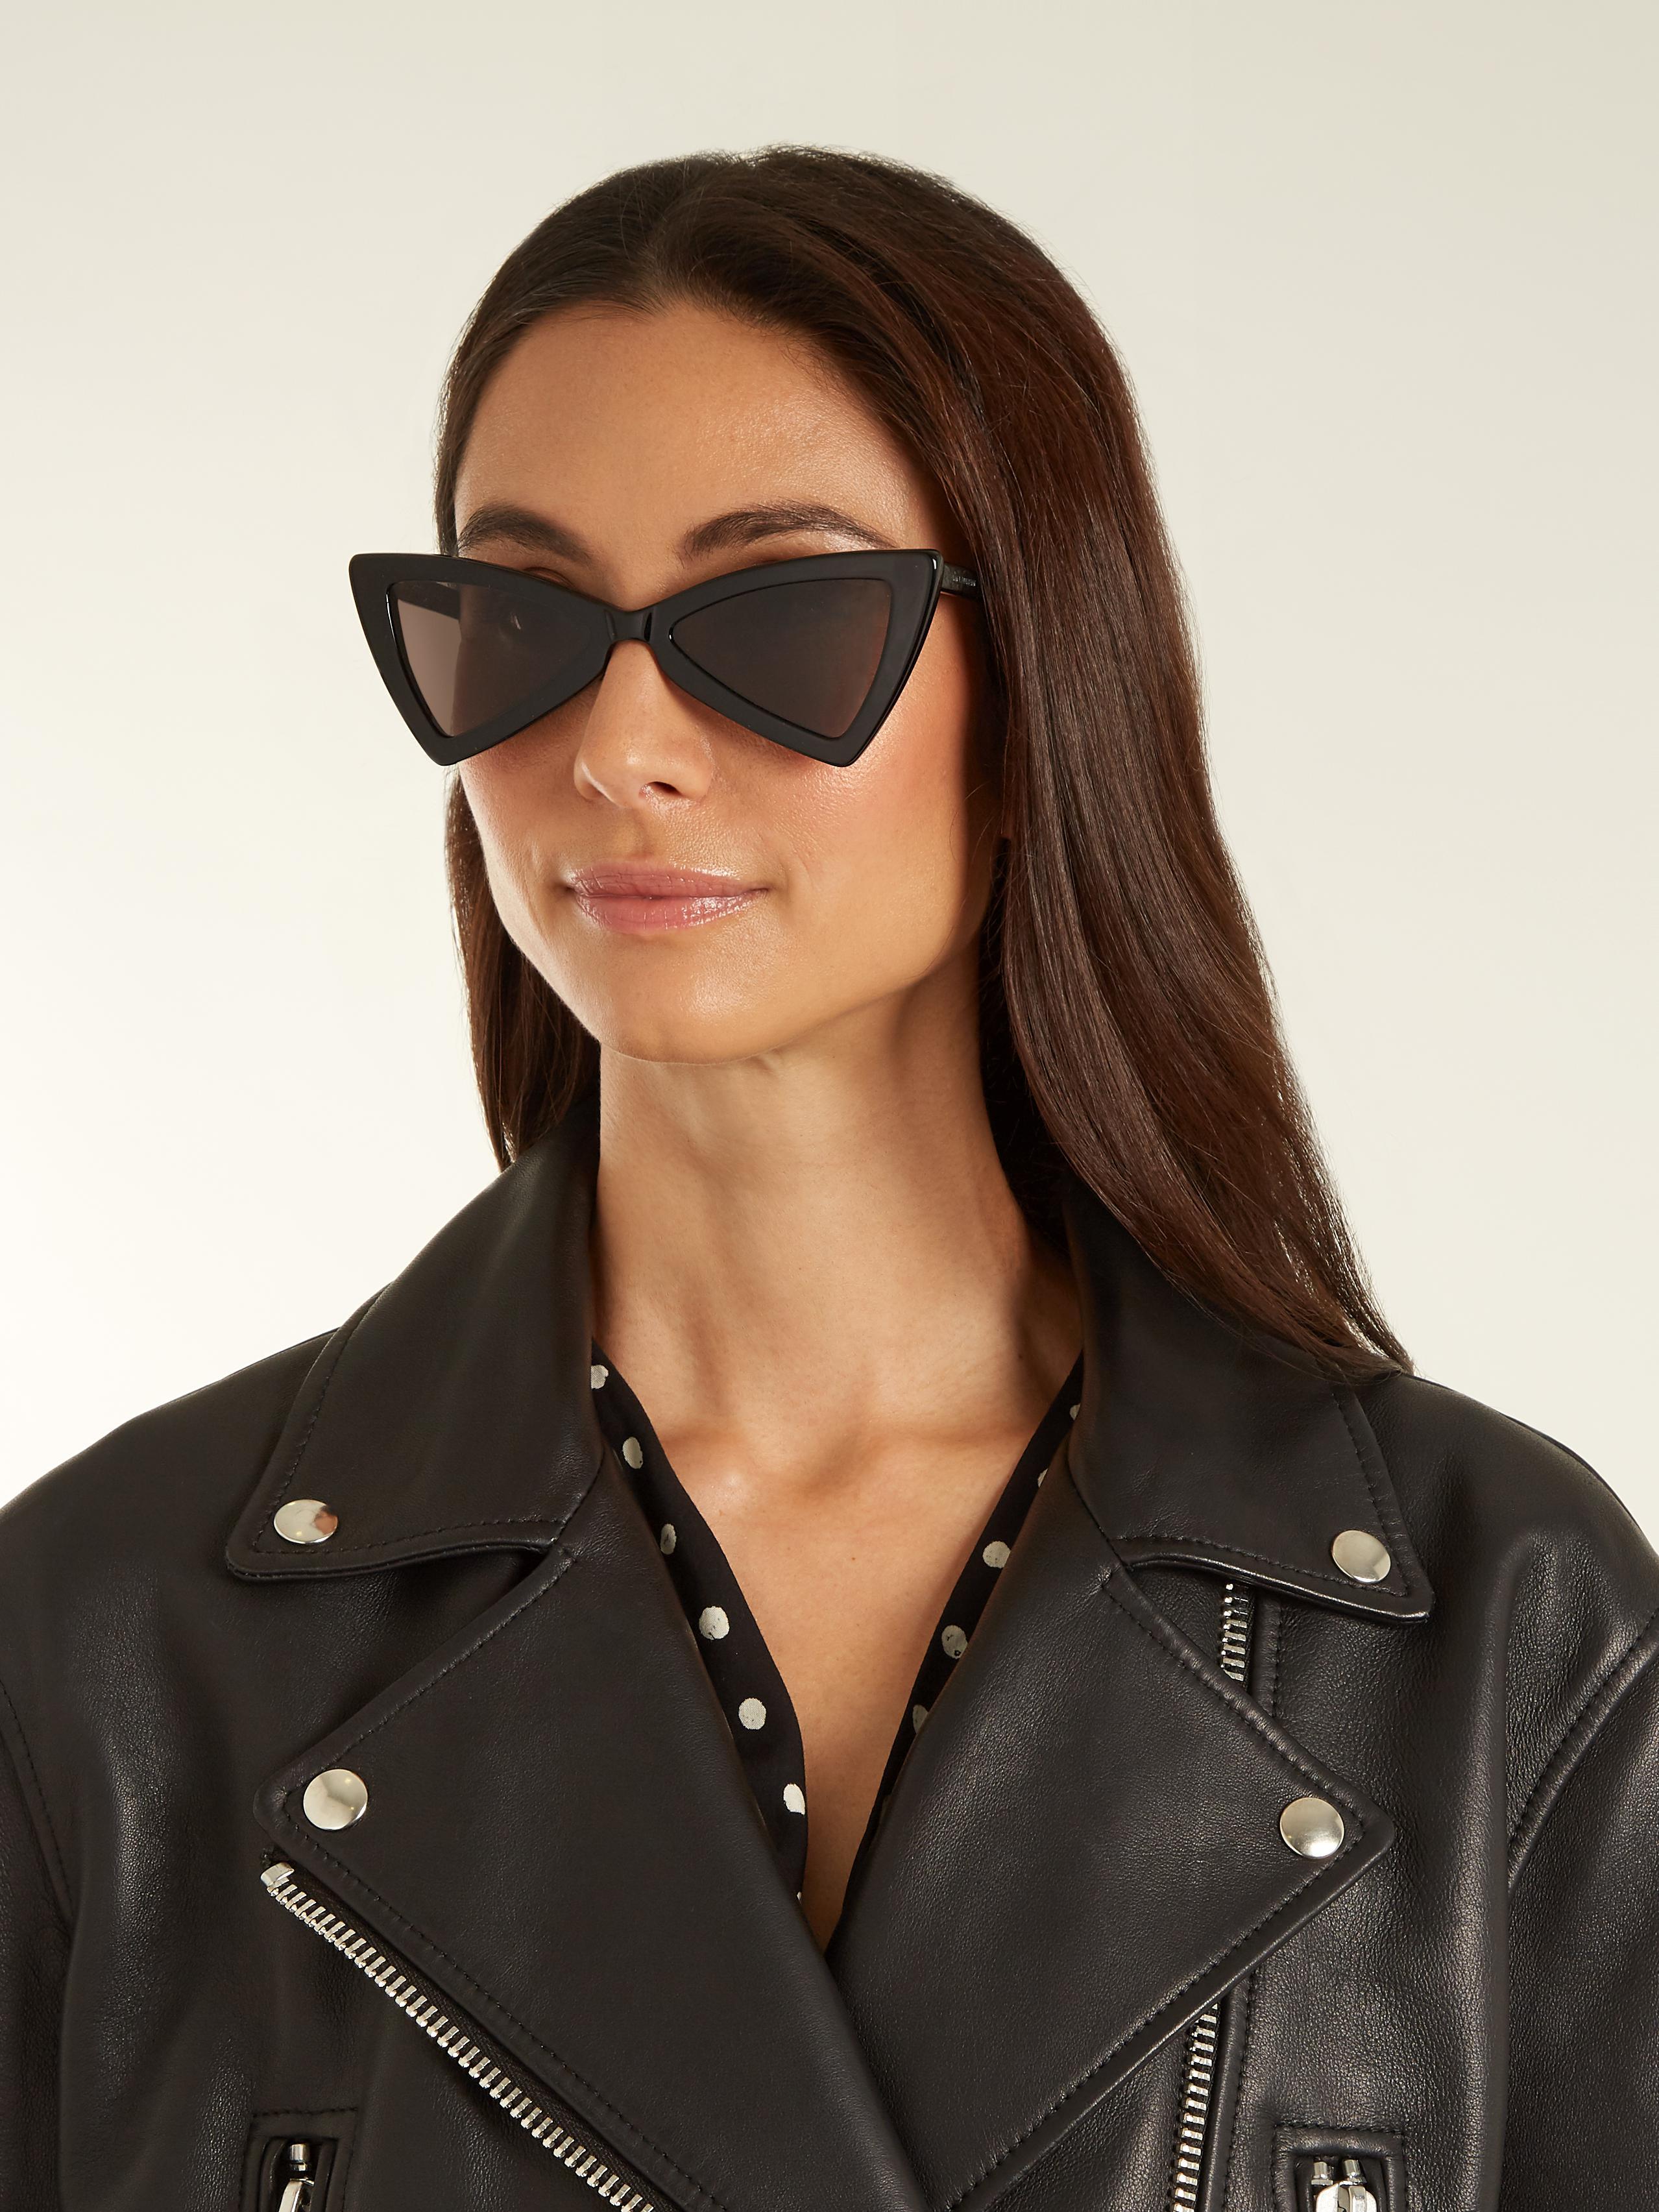 Jerry studded sunglasses - Black Saint Laurent Eyewear lvB5aok8gE